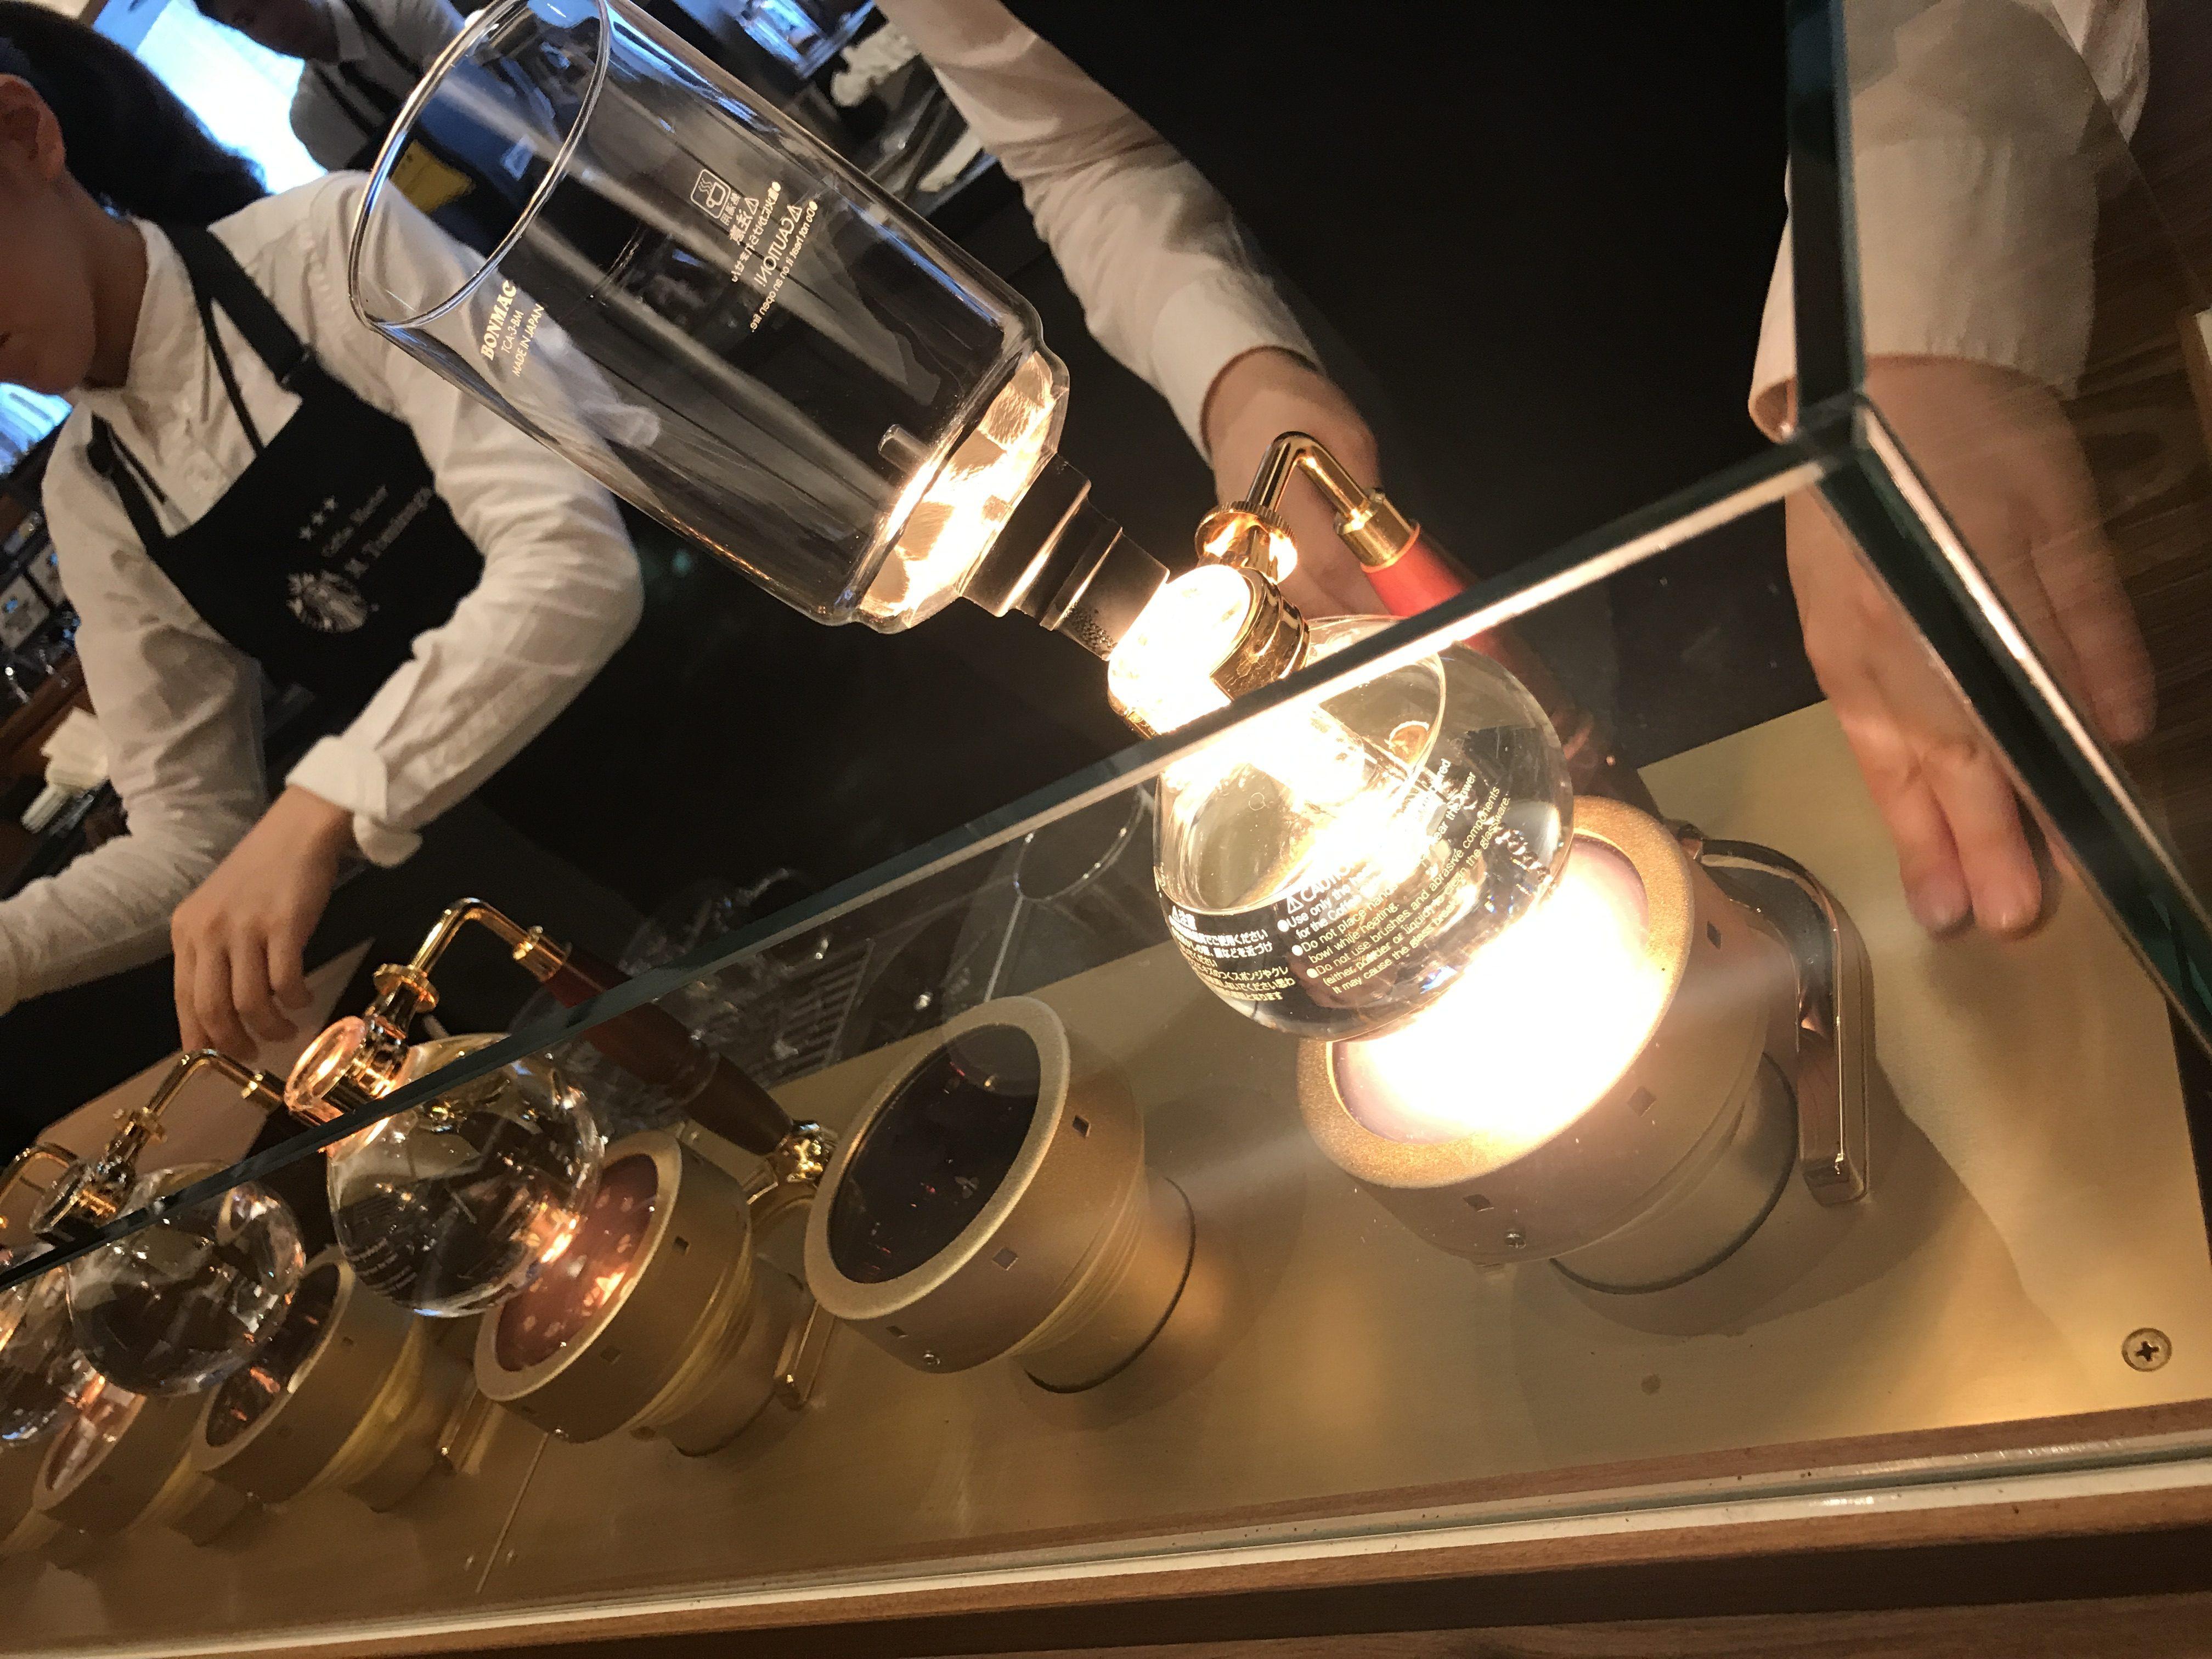 GINZA SIXのStarbucks Reserve Barで、バリスタから極上のサイフォンコーヒーの淹れ方を教えてもらった!